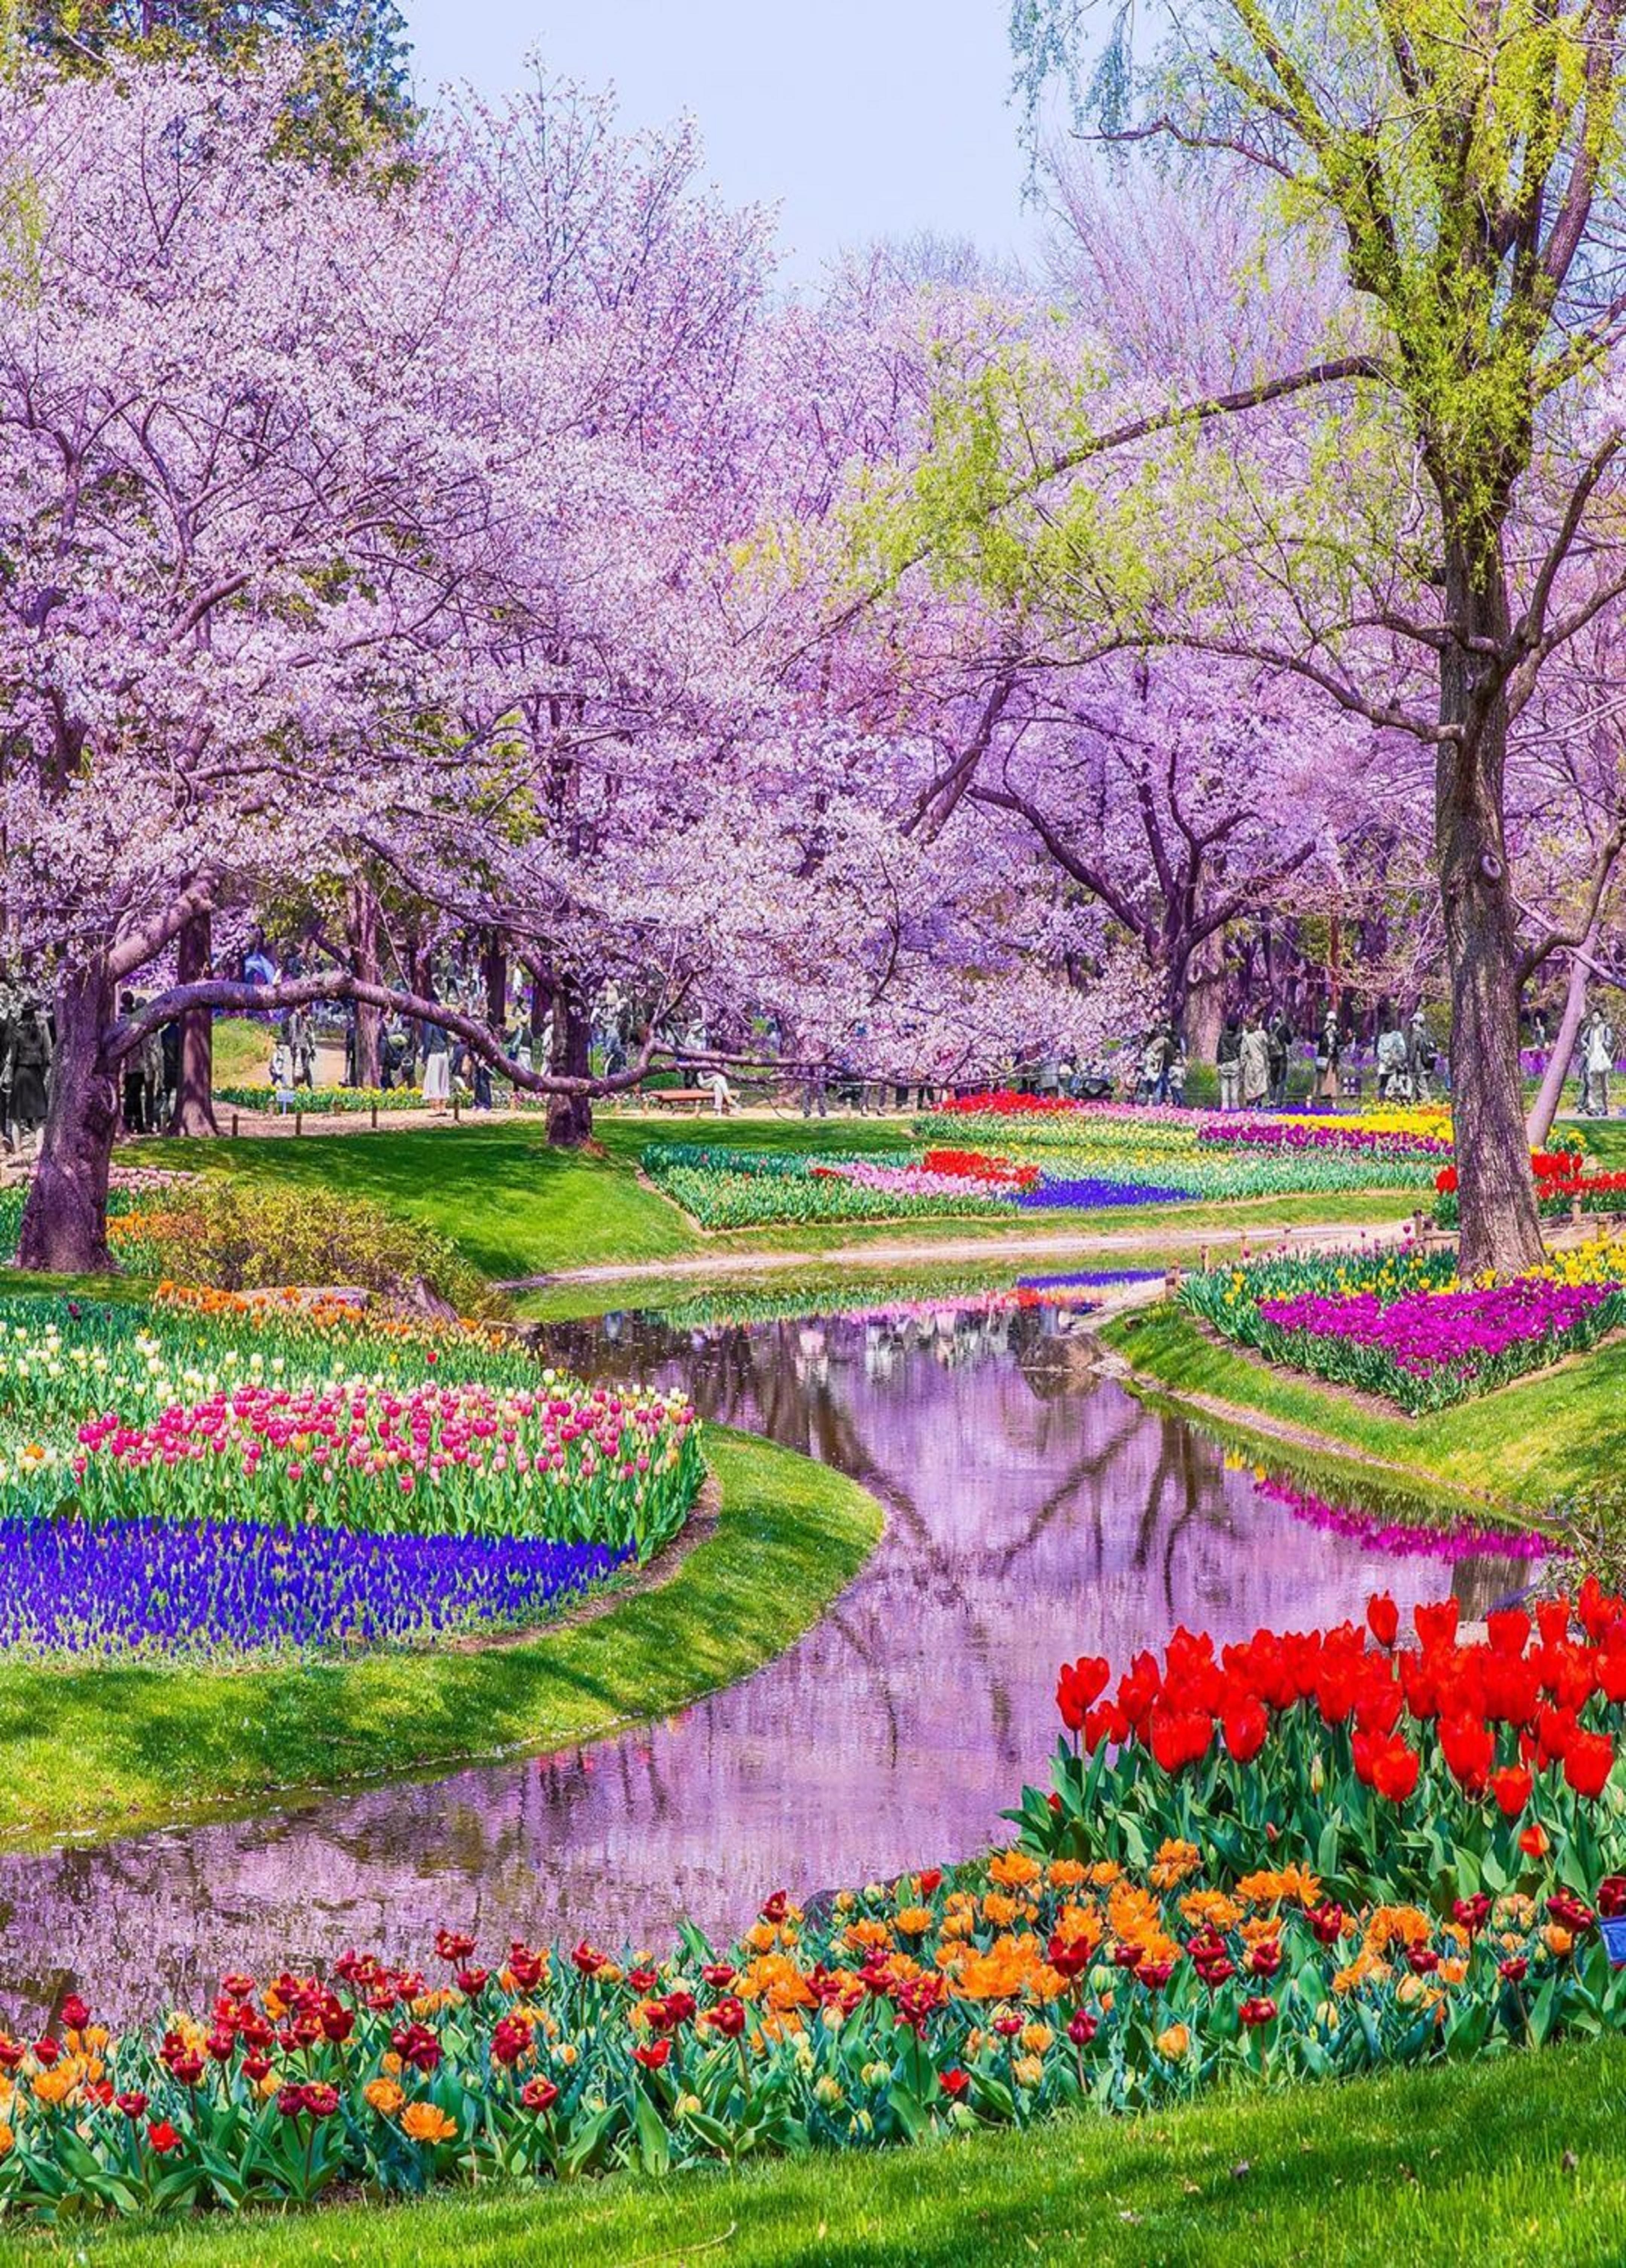 Pin By Ivanka Kostova On Vsichko Beautiful Landscape Photography Spring Scenery Beautiful Landscapes